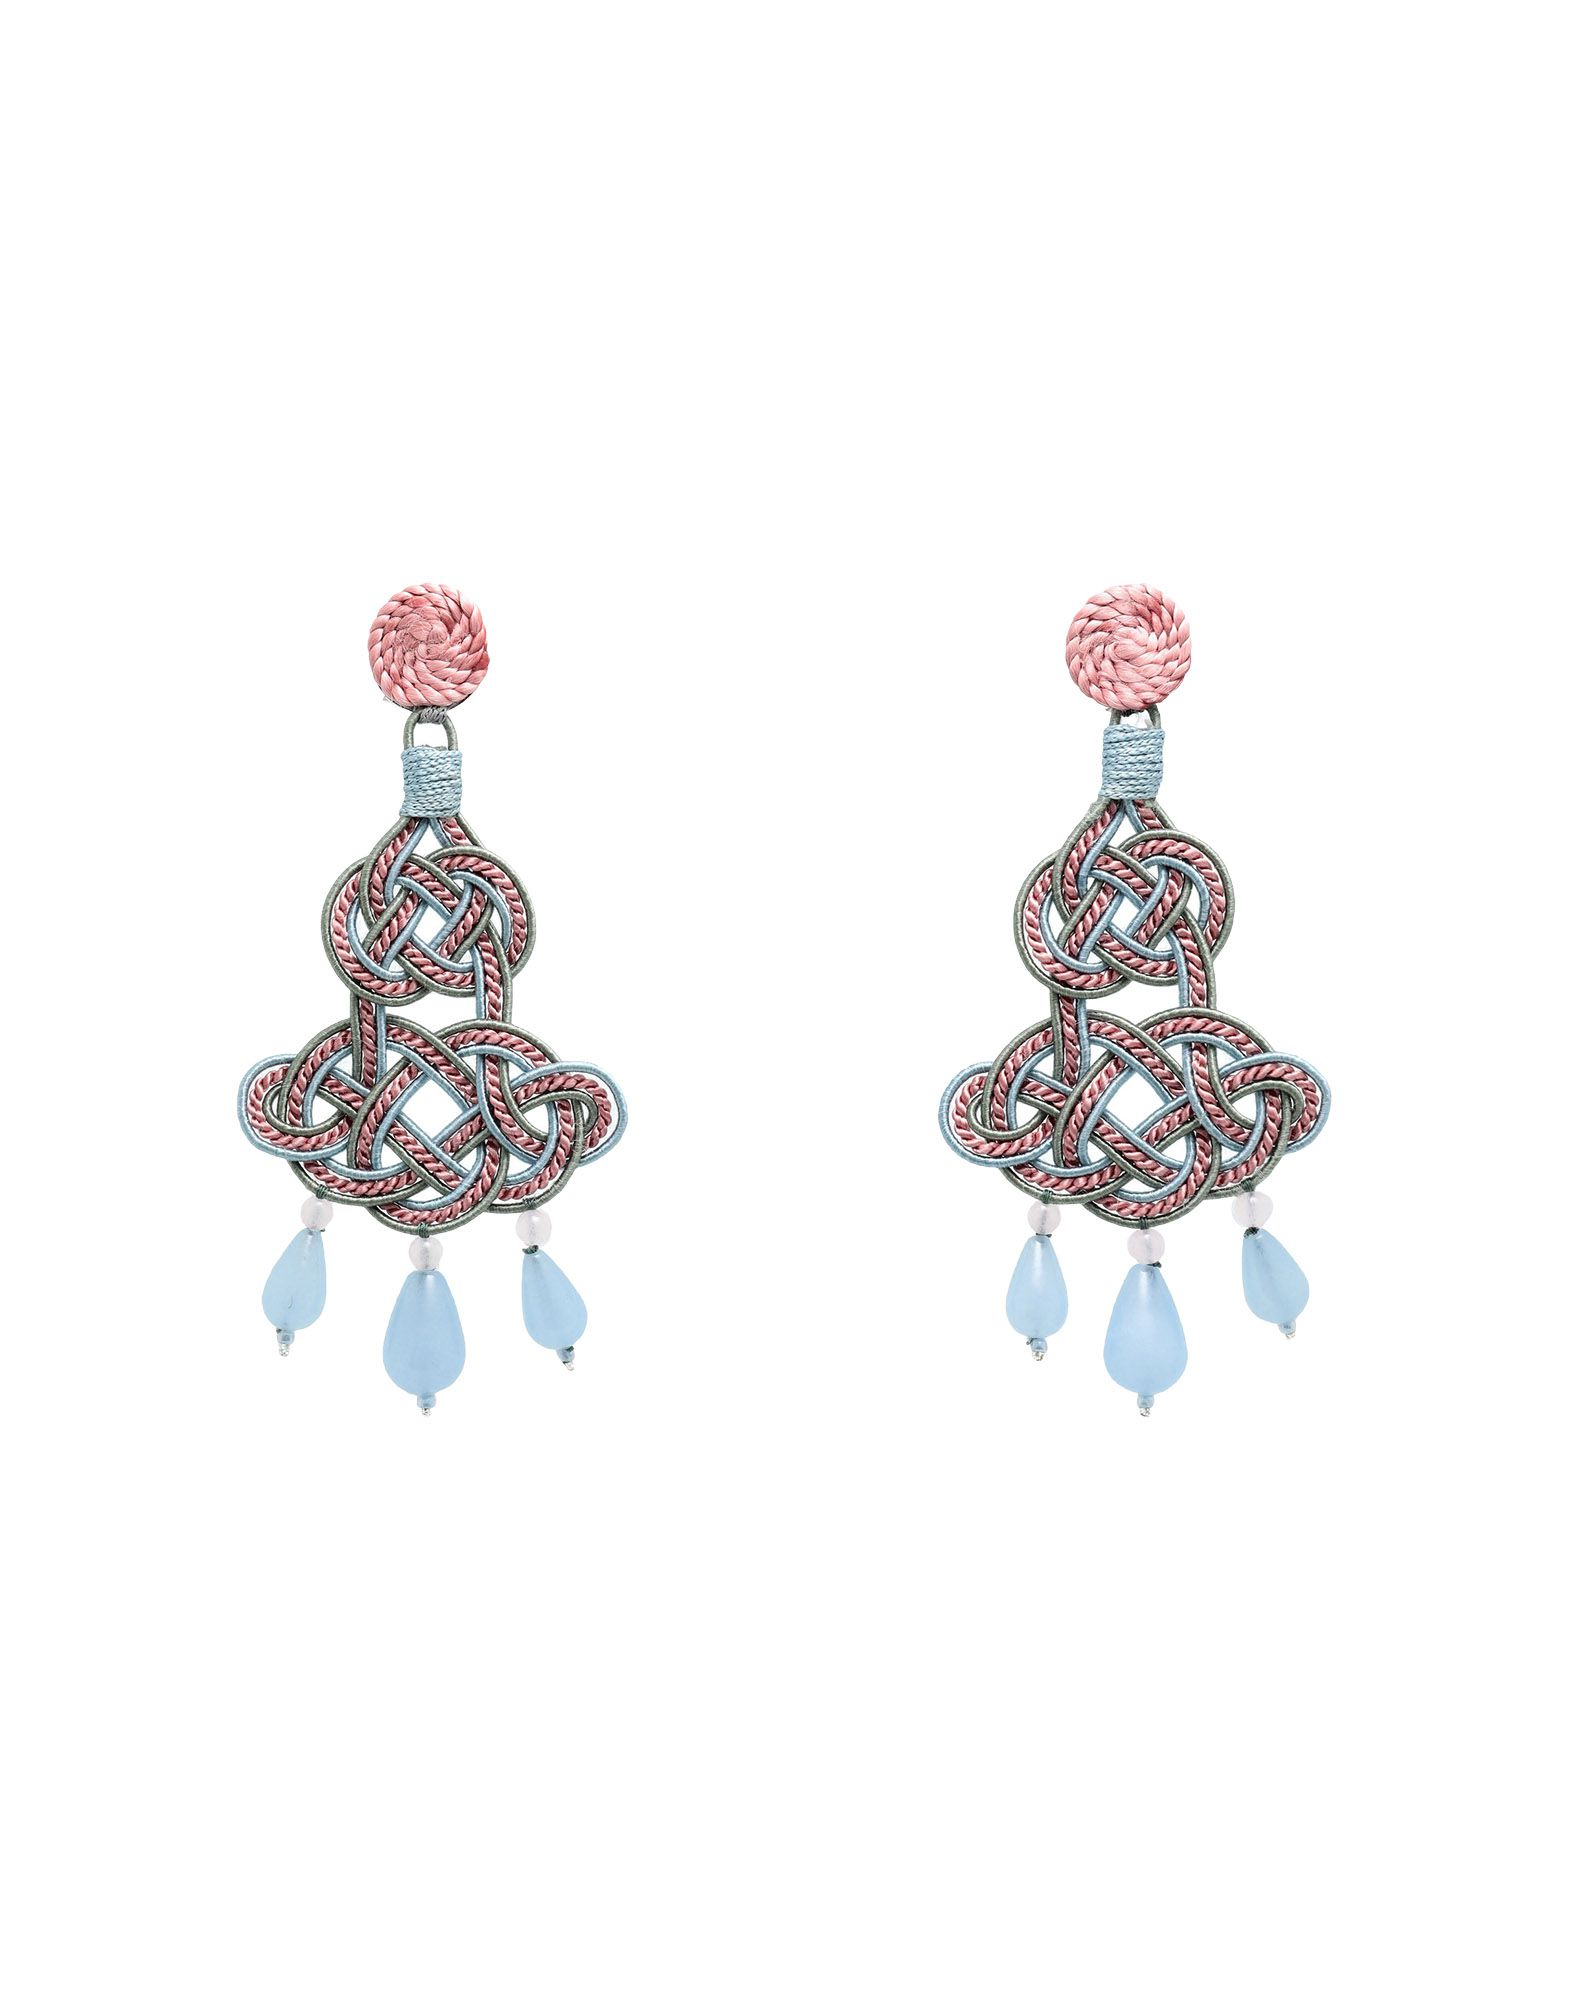 ANNA E ALEX Earrings in Pink